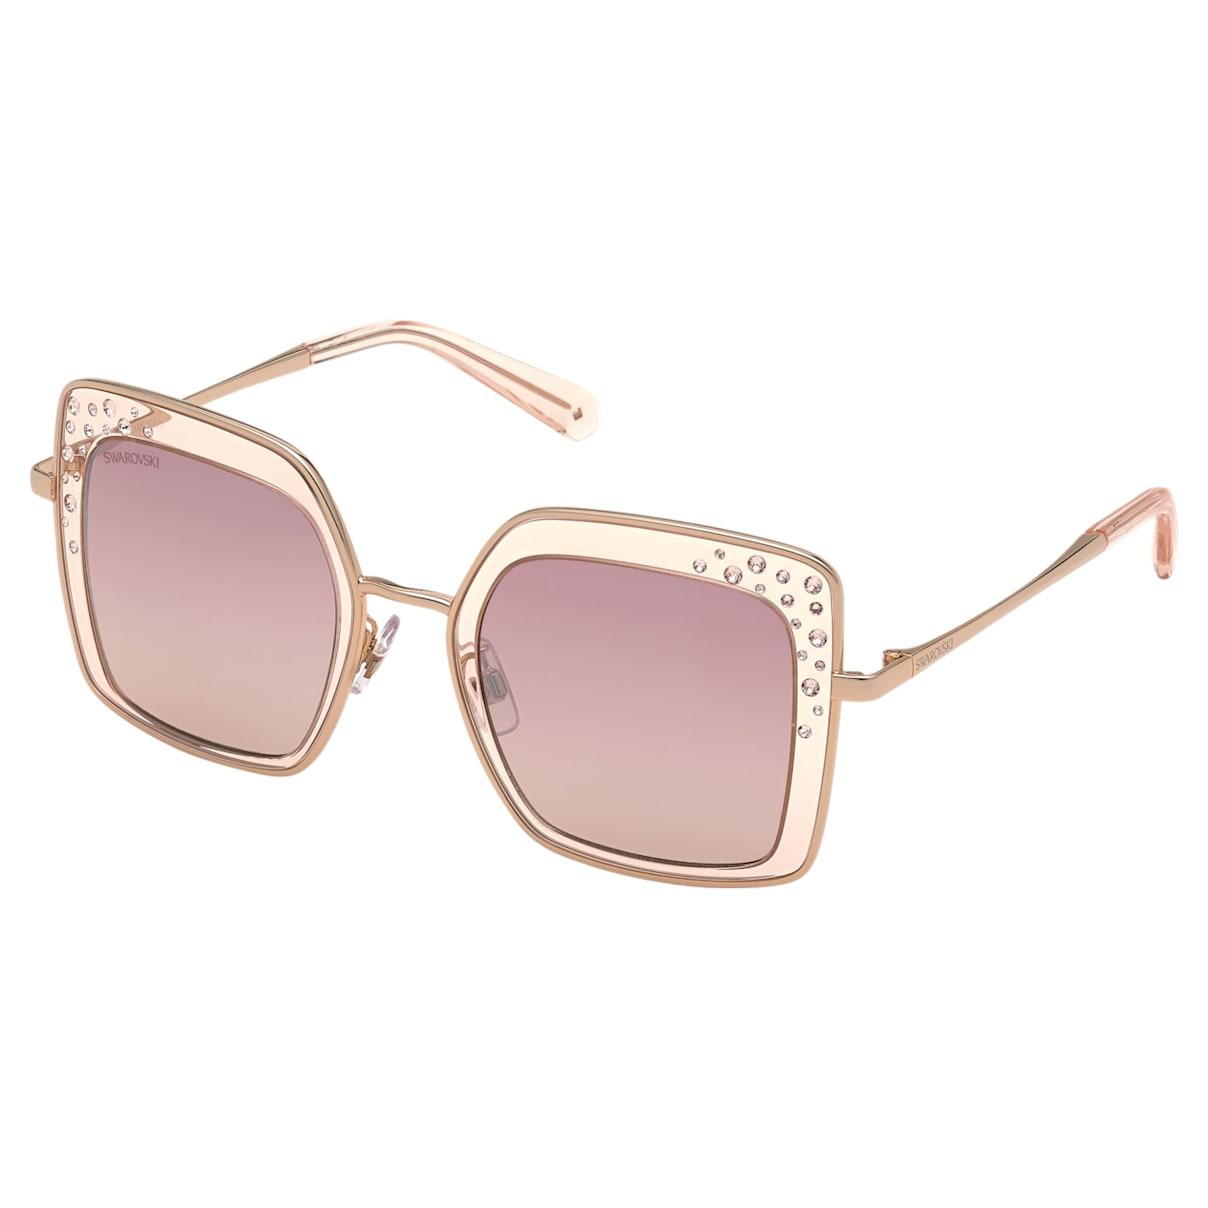 Swarovski Sunglasses, SK 0324-H 57F, Beige